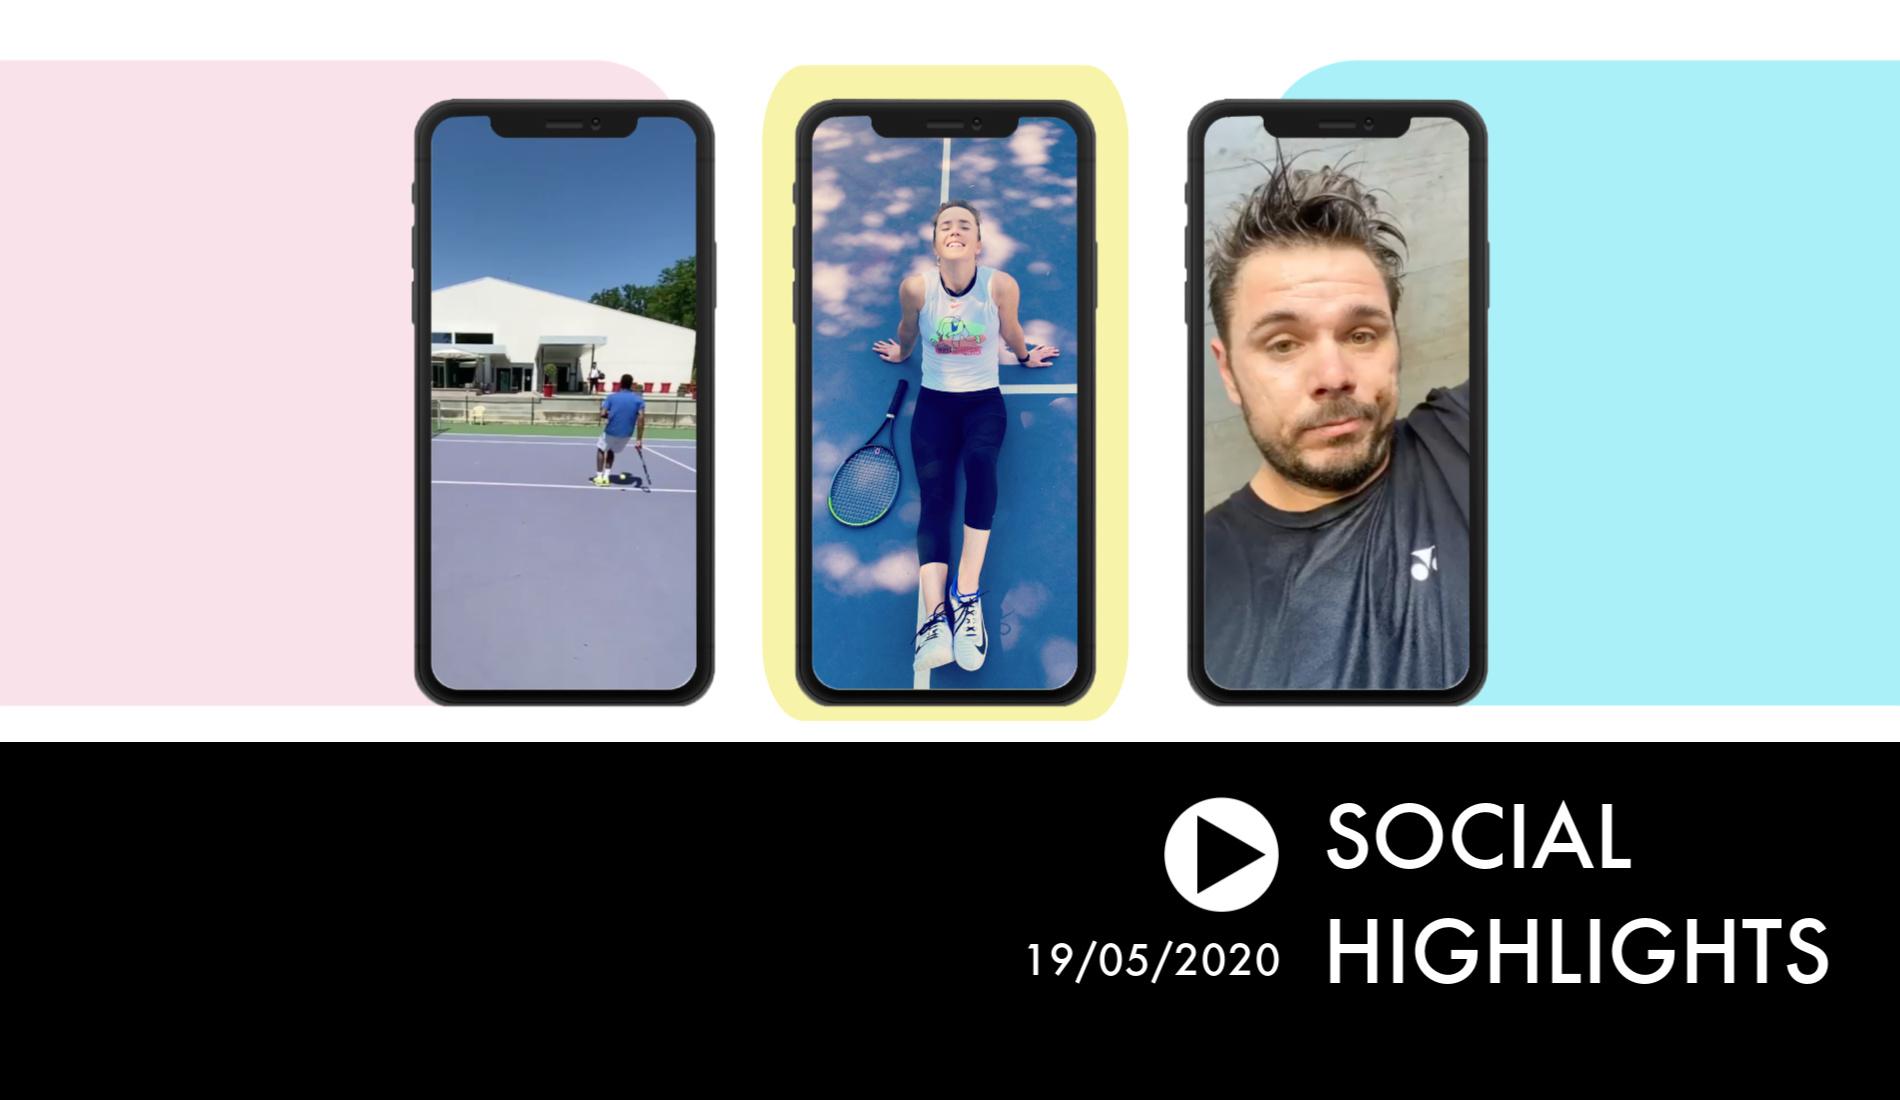 Social Highlights 9 - Monfils trick shots